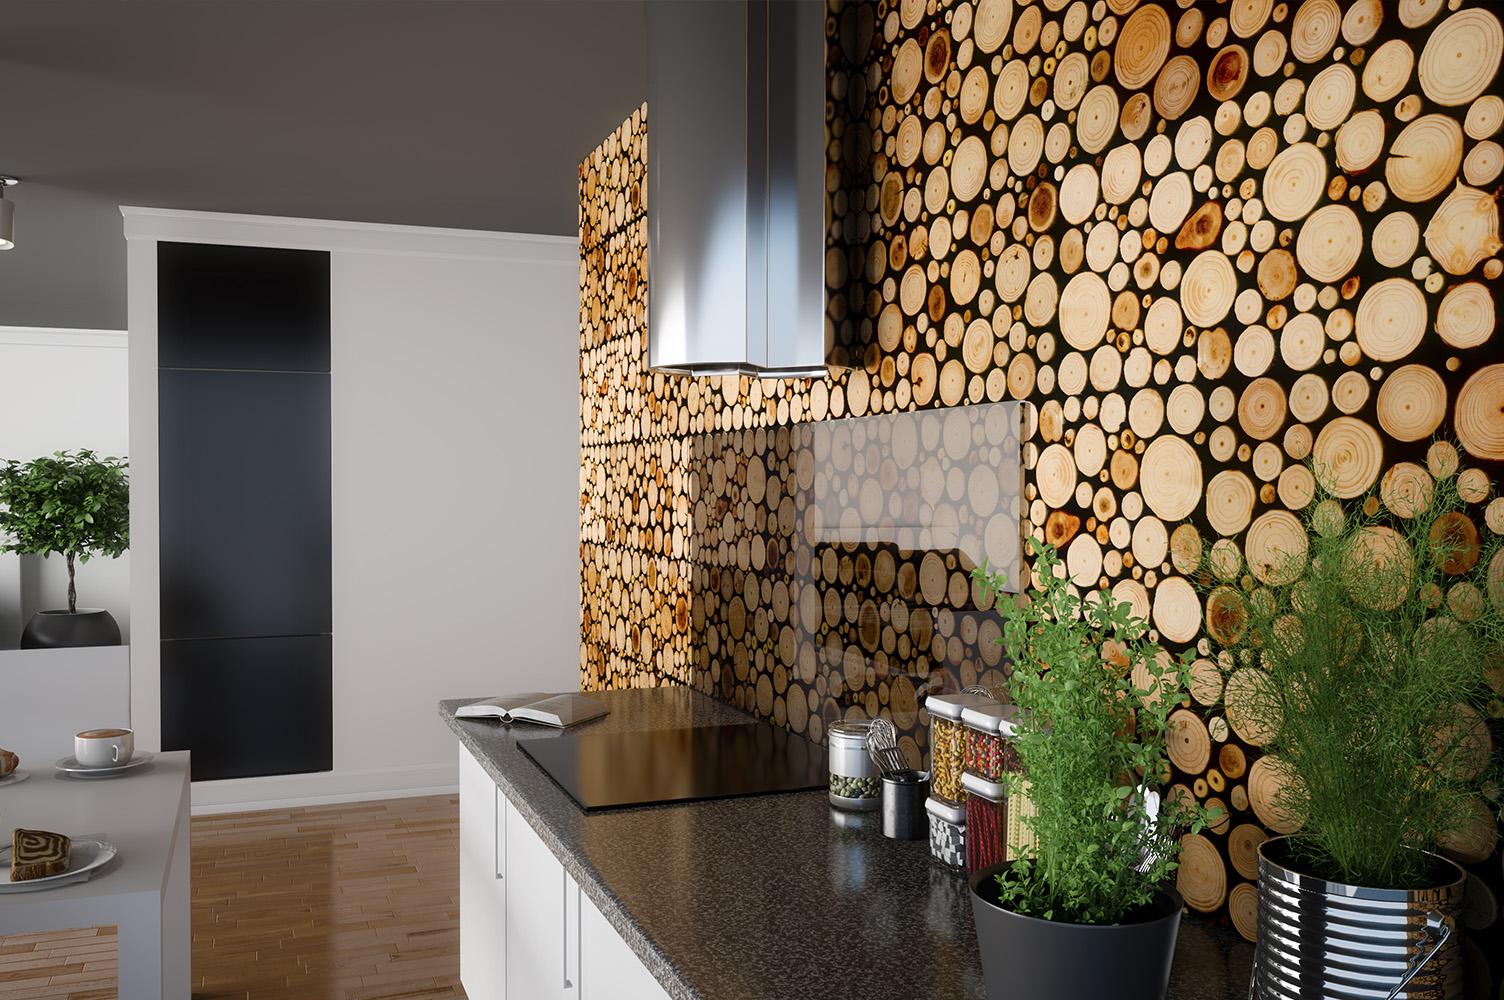 3D Holz Paneele